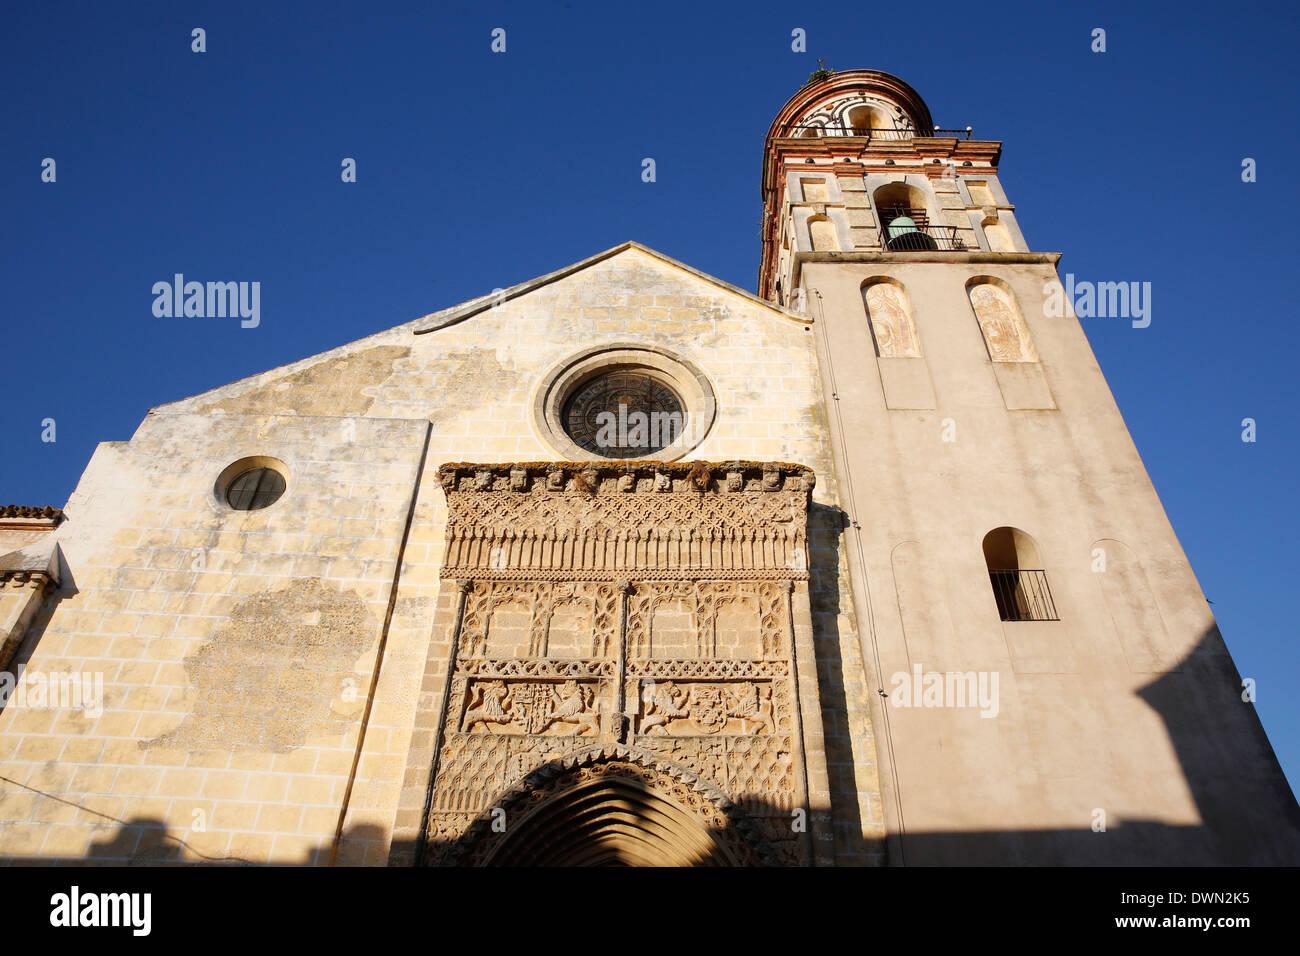 The 14th century Gothic-Mudejar church of Nuestra Senora de la O, Sanlucar de Barrameda, Andalucia, Spain, Europe - Stock Image